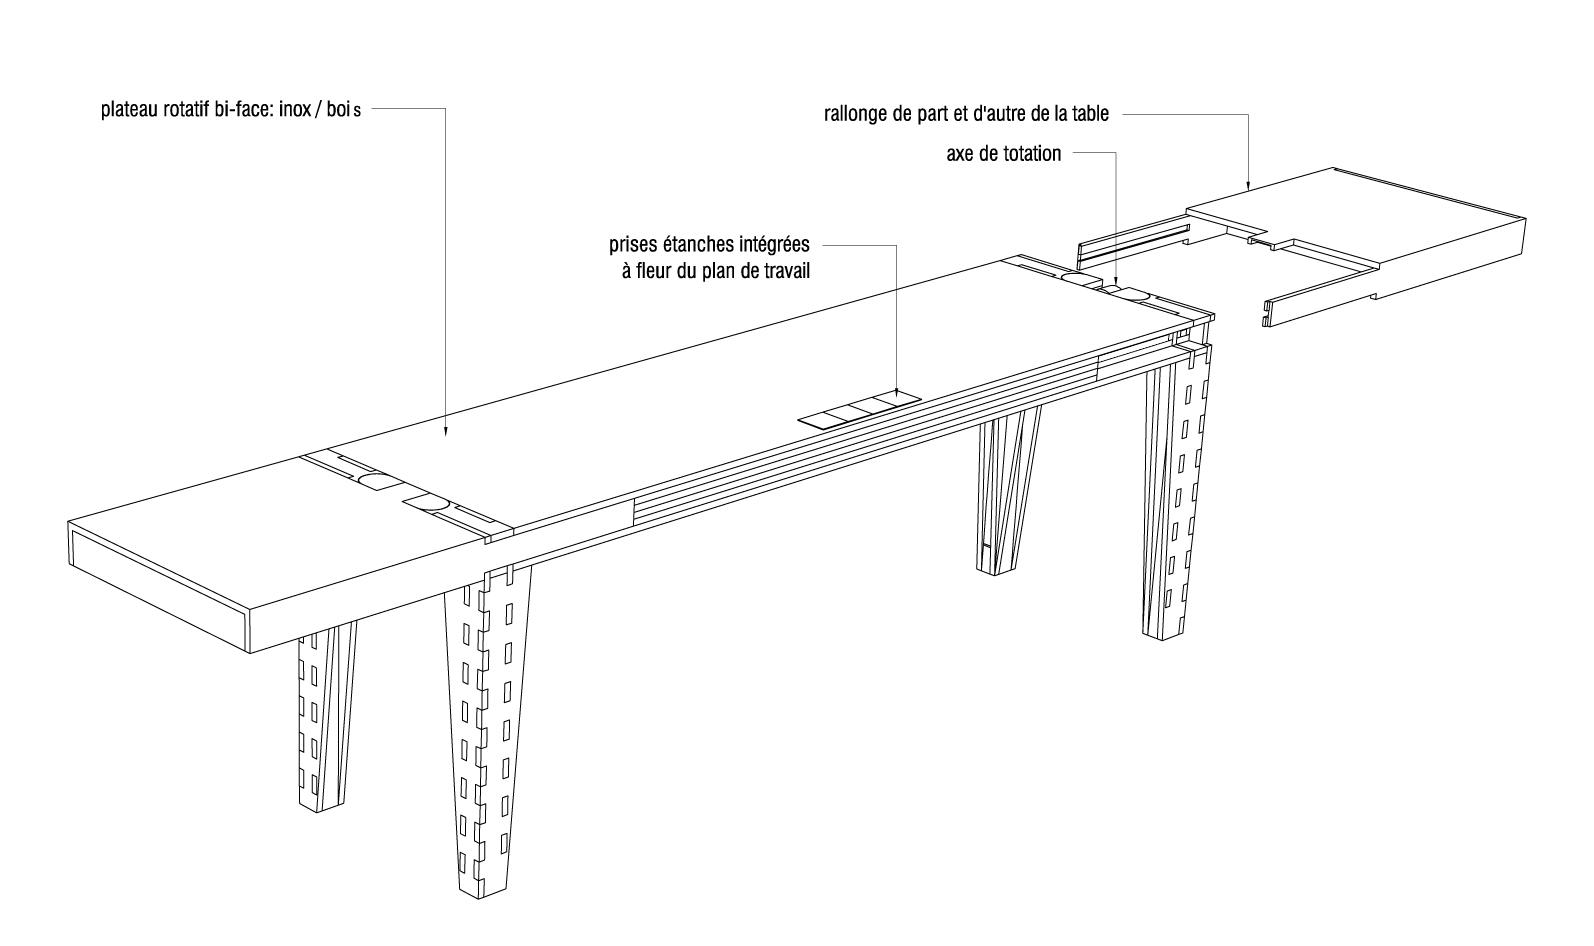 E:ARCHIATELIER JMCA�1-PROJETS�37-TABLE FOODLABCOMMUNICATION